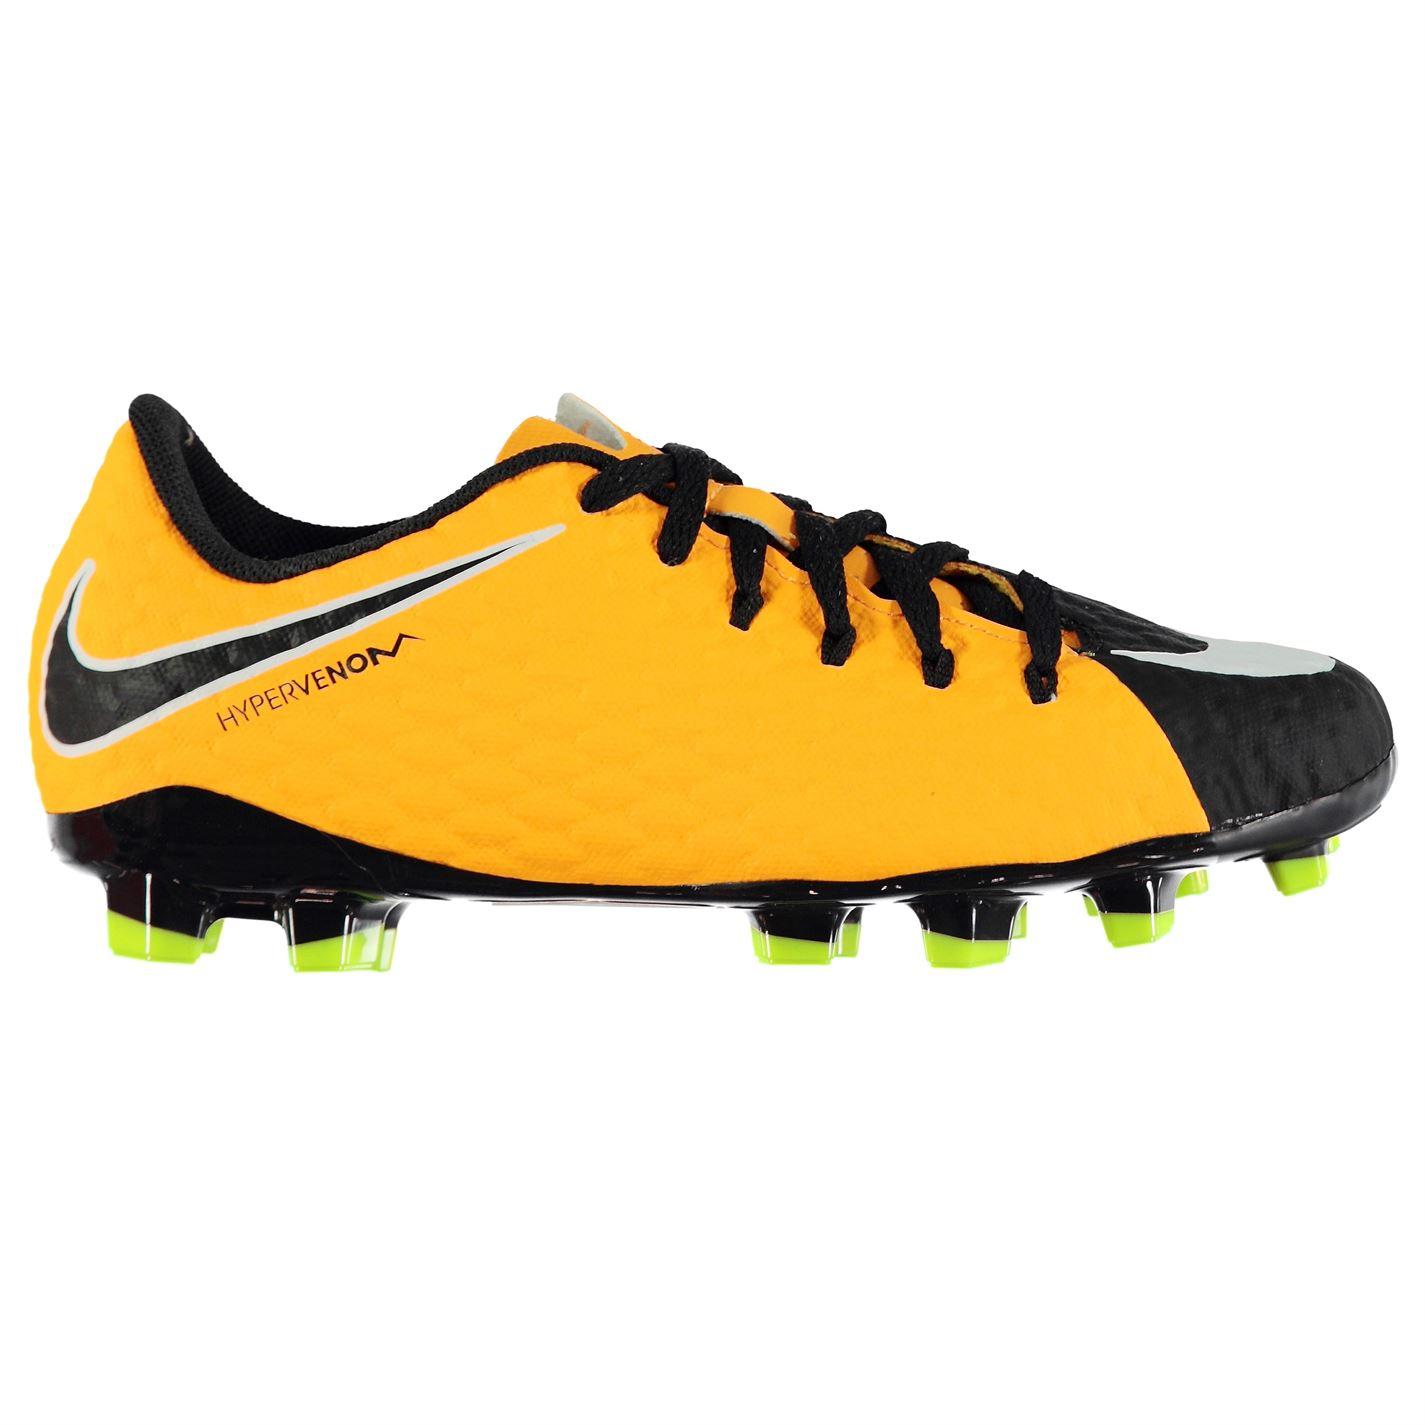 Nike Hypervenom Phelon 3 FG Junior Football Boots